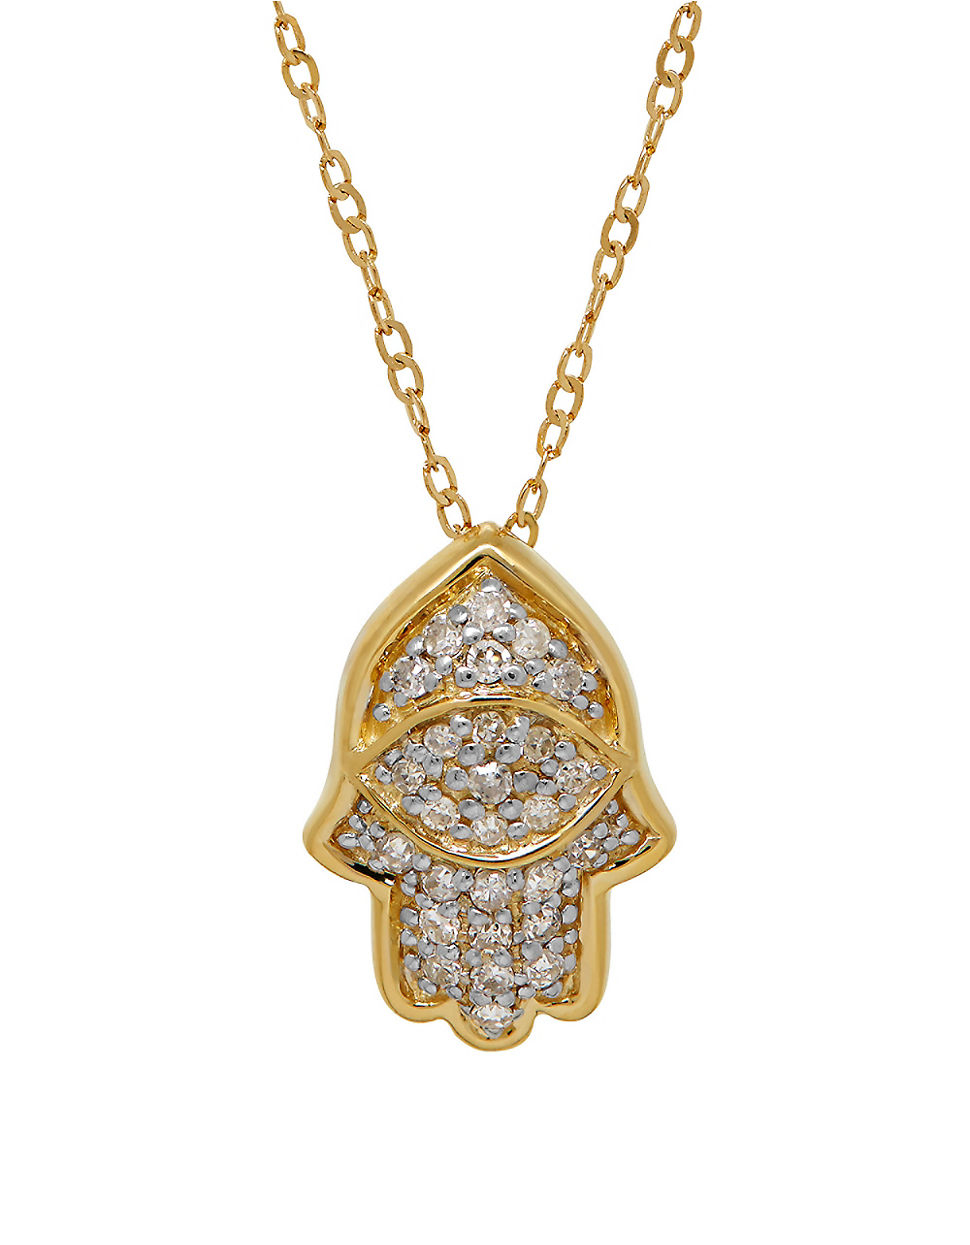 lord taylor diamond and 14k yellow gold hamsa pendant